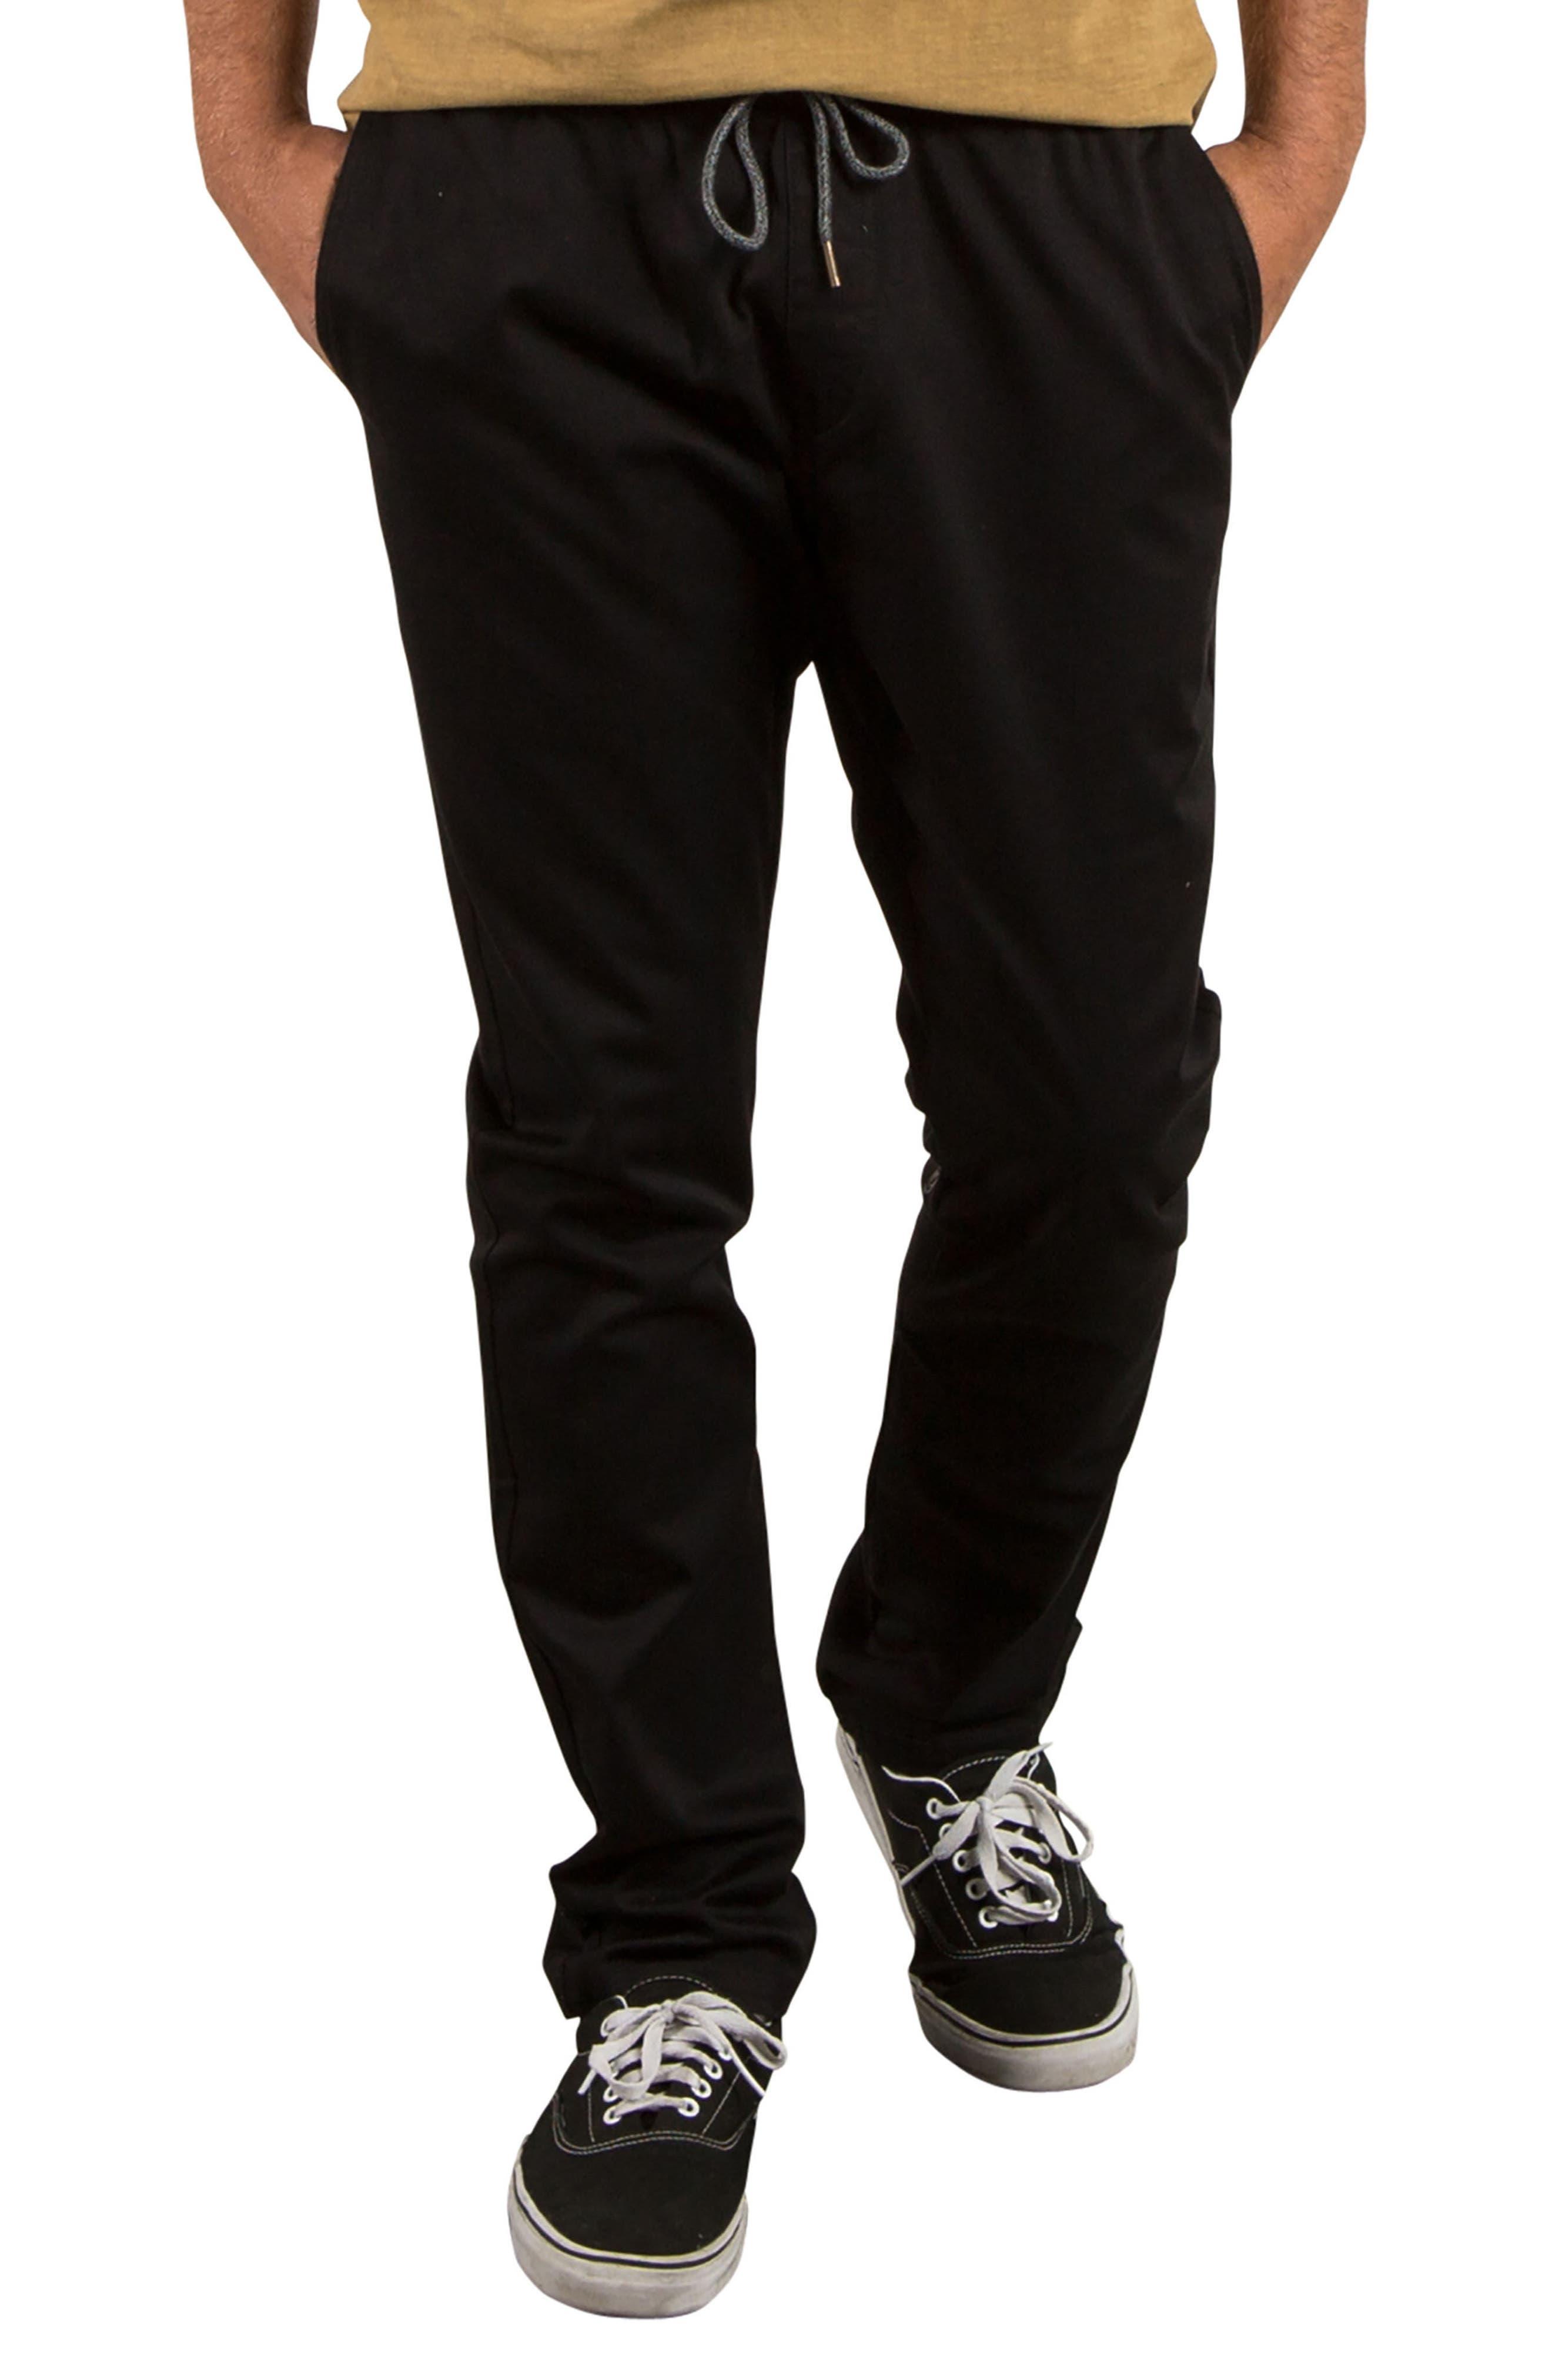 Comfort Chino Pants,                         Main,                         color, Black